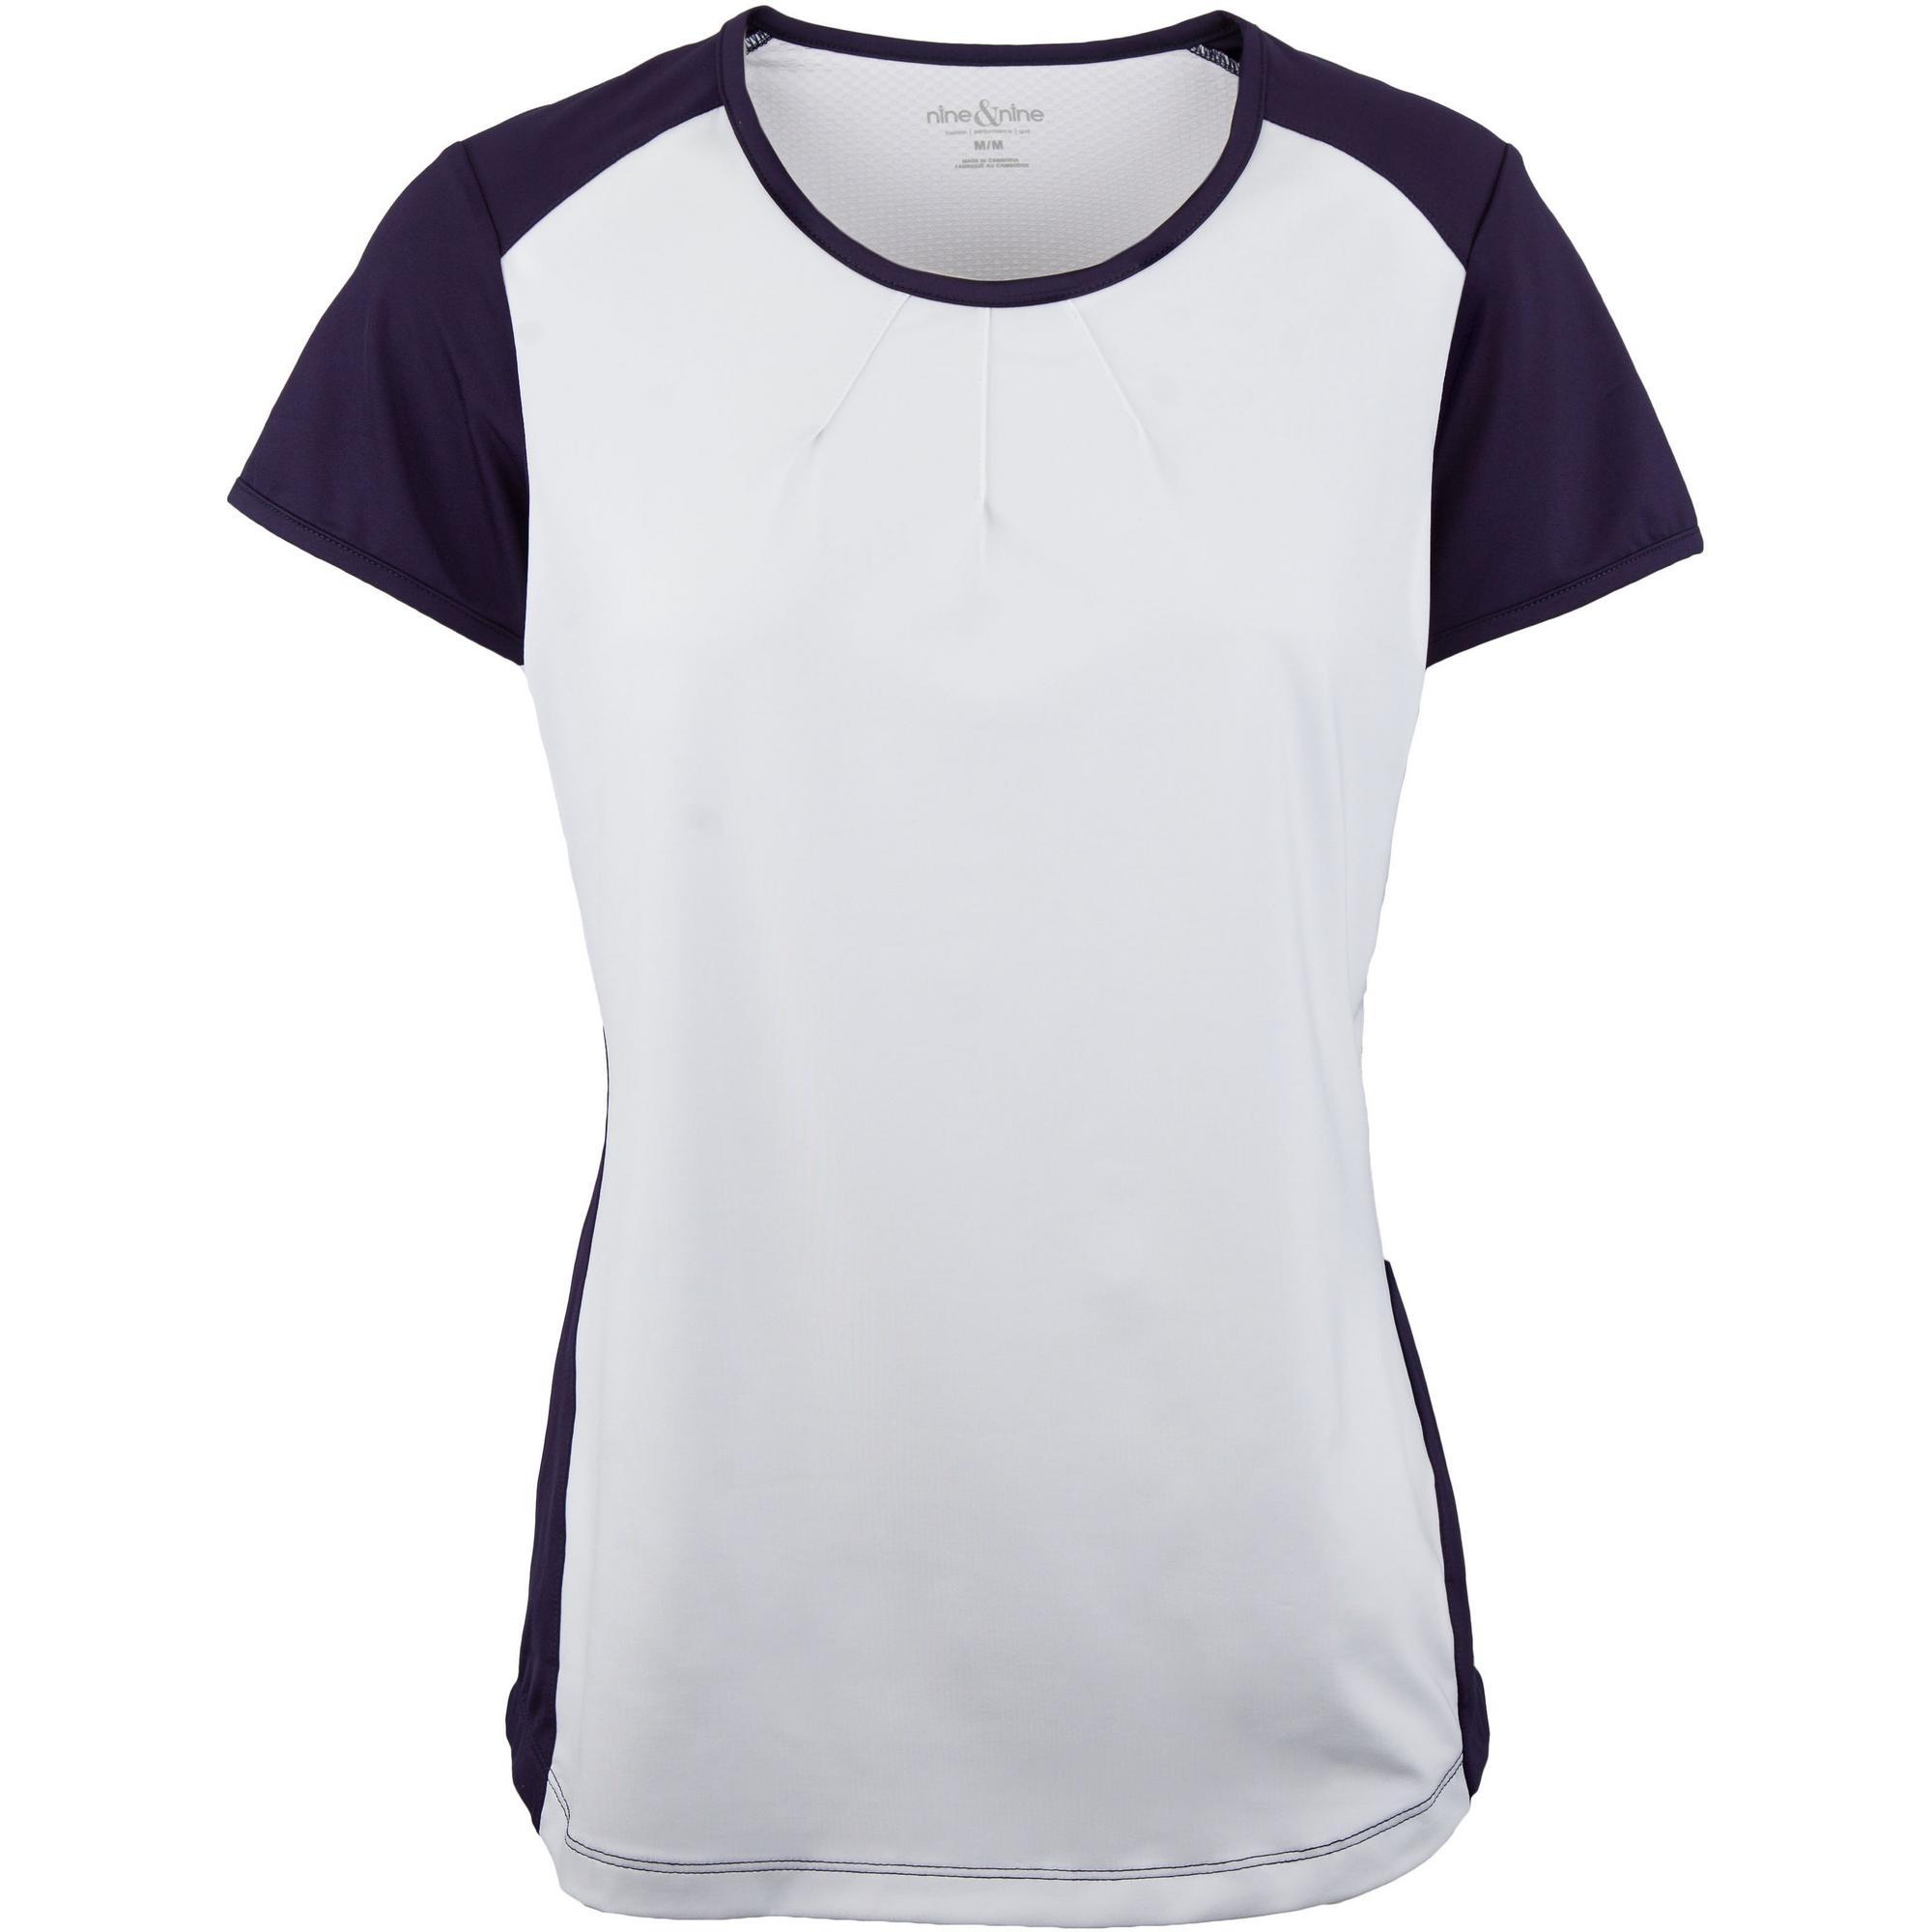 Womens Short Sleeve Crew Neck Fitness Top